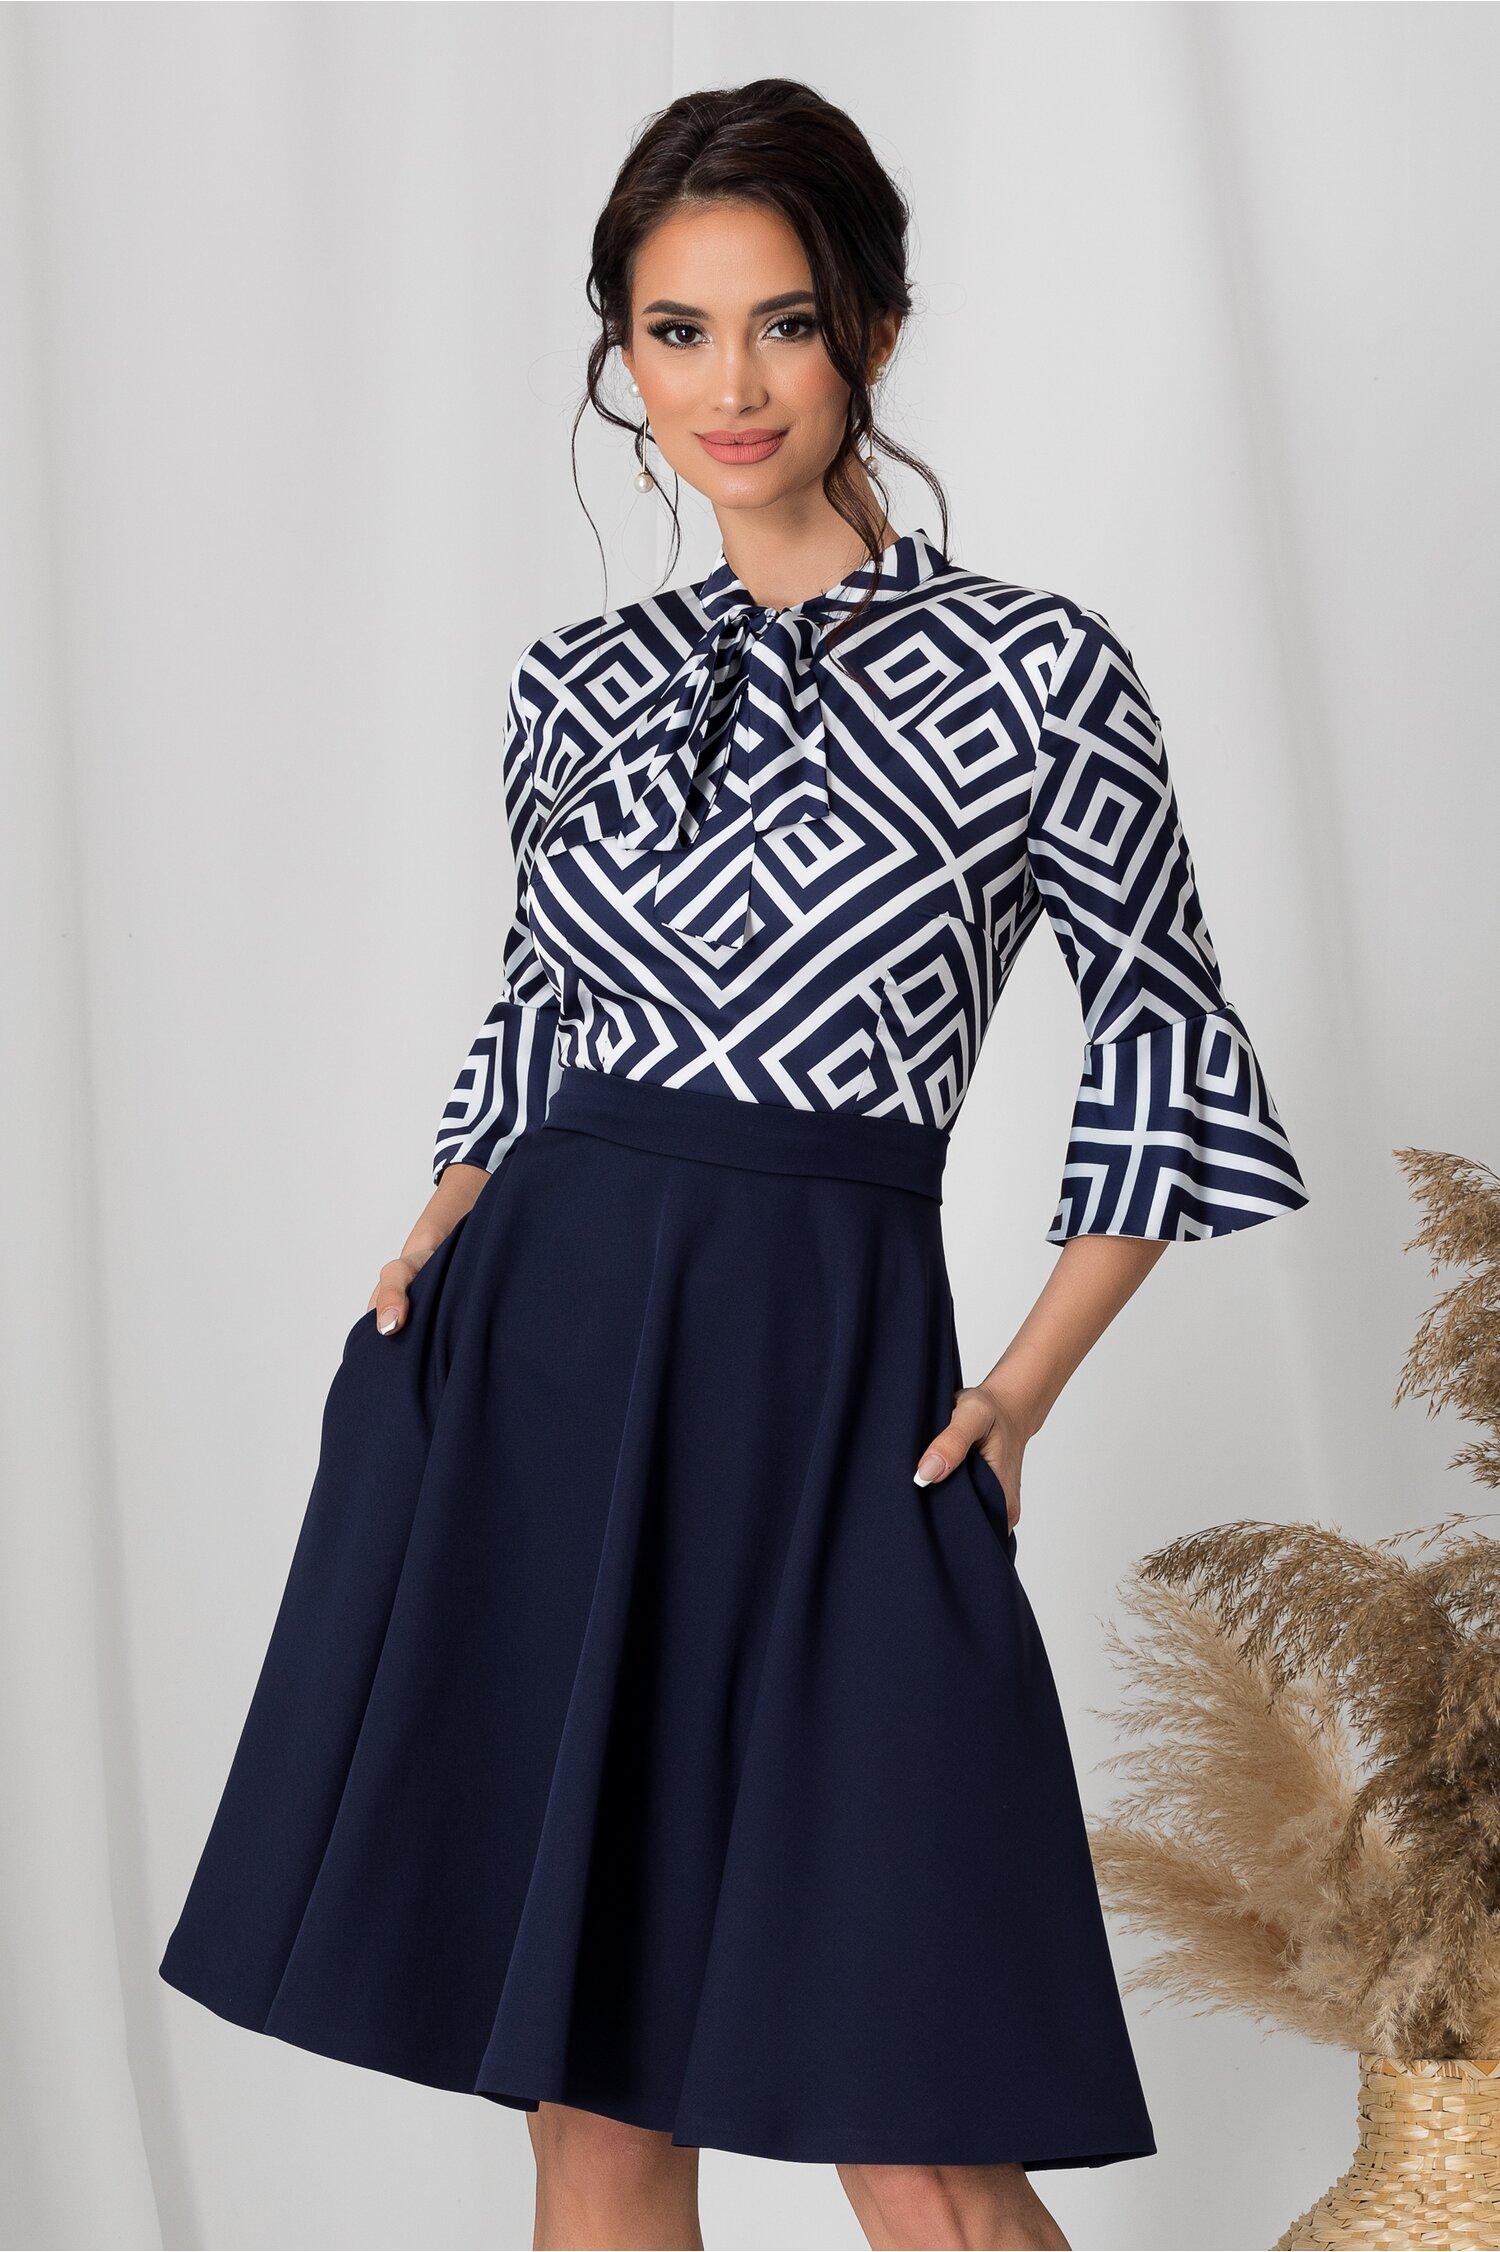 Rochie MBG cu fusta bleumarin si bluza alba cu imprimeu geometric bleumarin imagine dyfashion.ro 2021